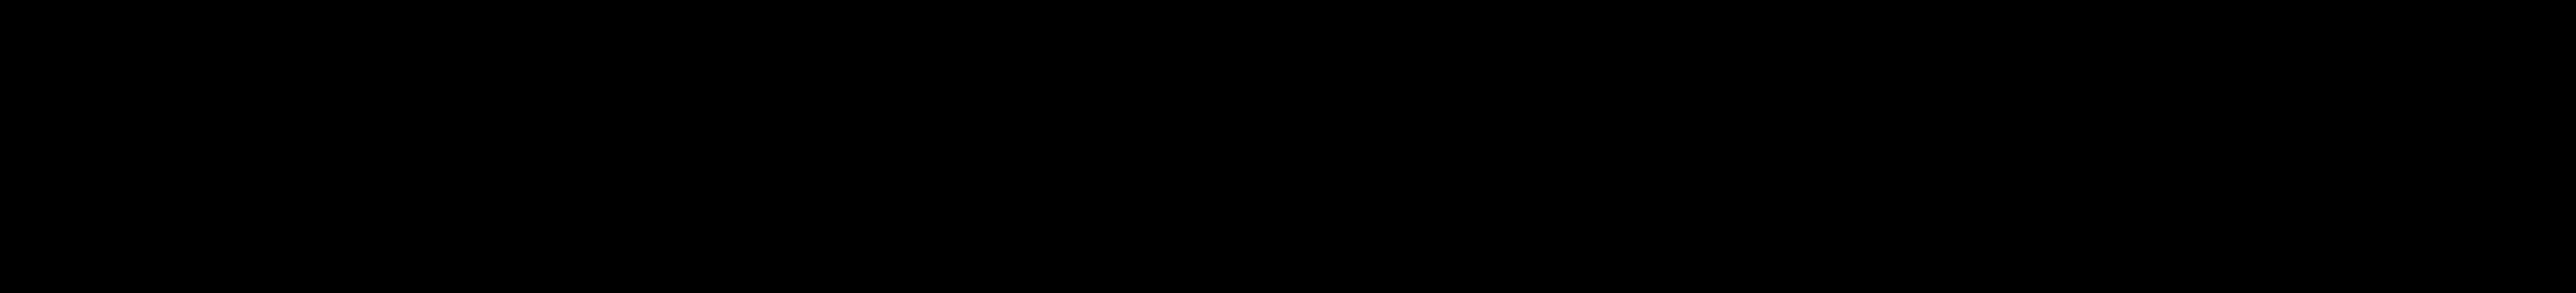 Printable square l uma. Clipart ruler blank